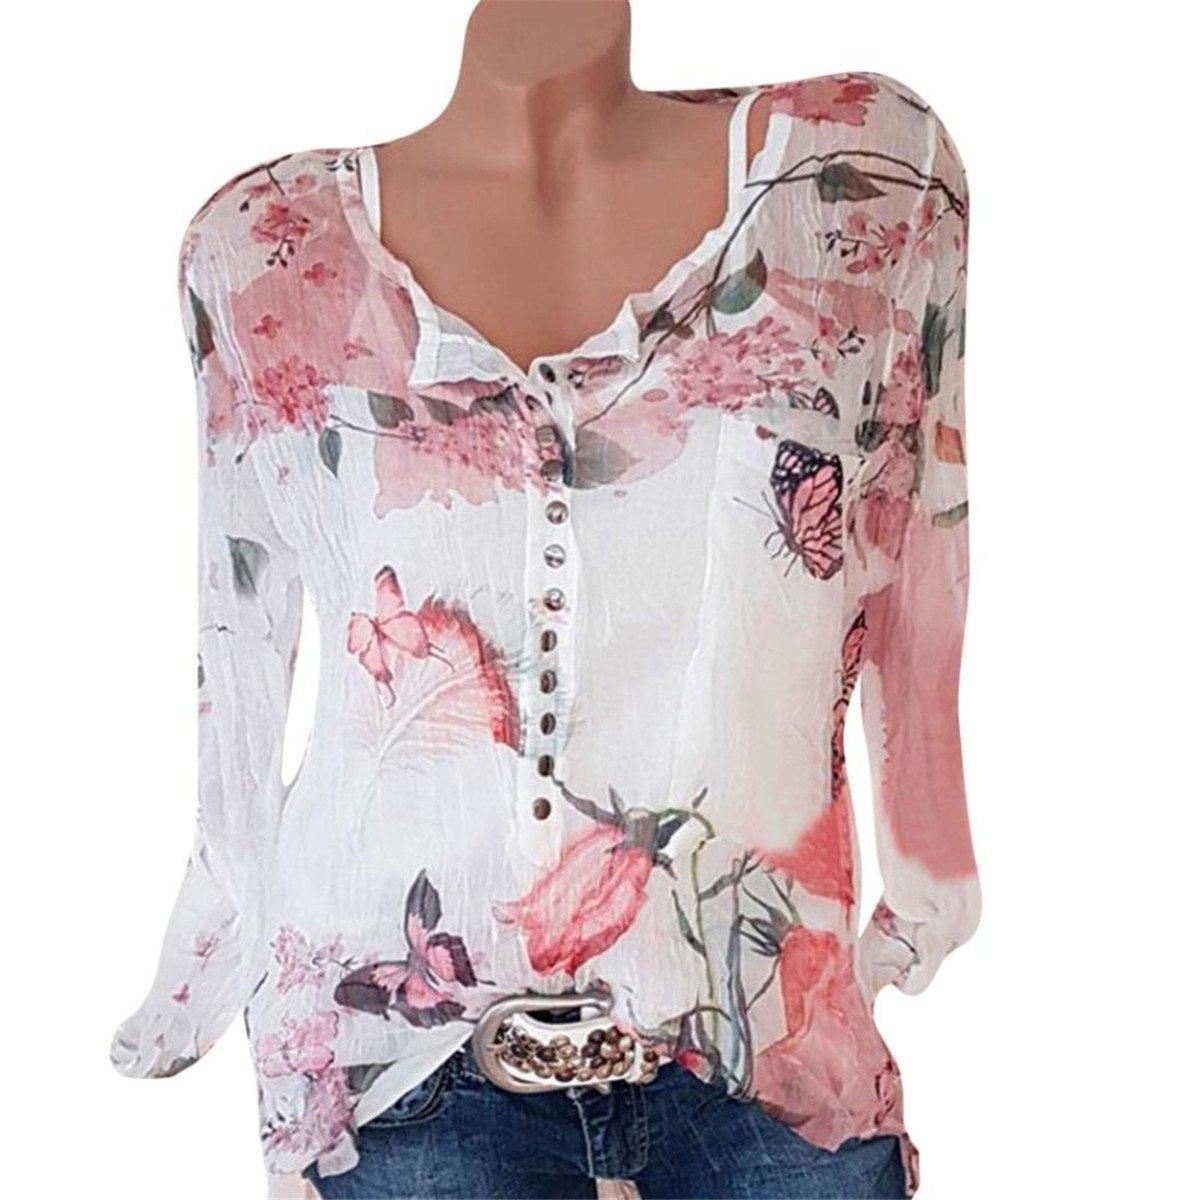 HongXander Plus Size Women Casual Floral Printed Beach Blouse Button T-Shirt Chiffon Irregular Hem Top